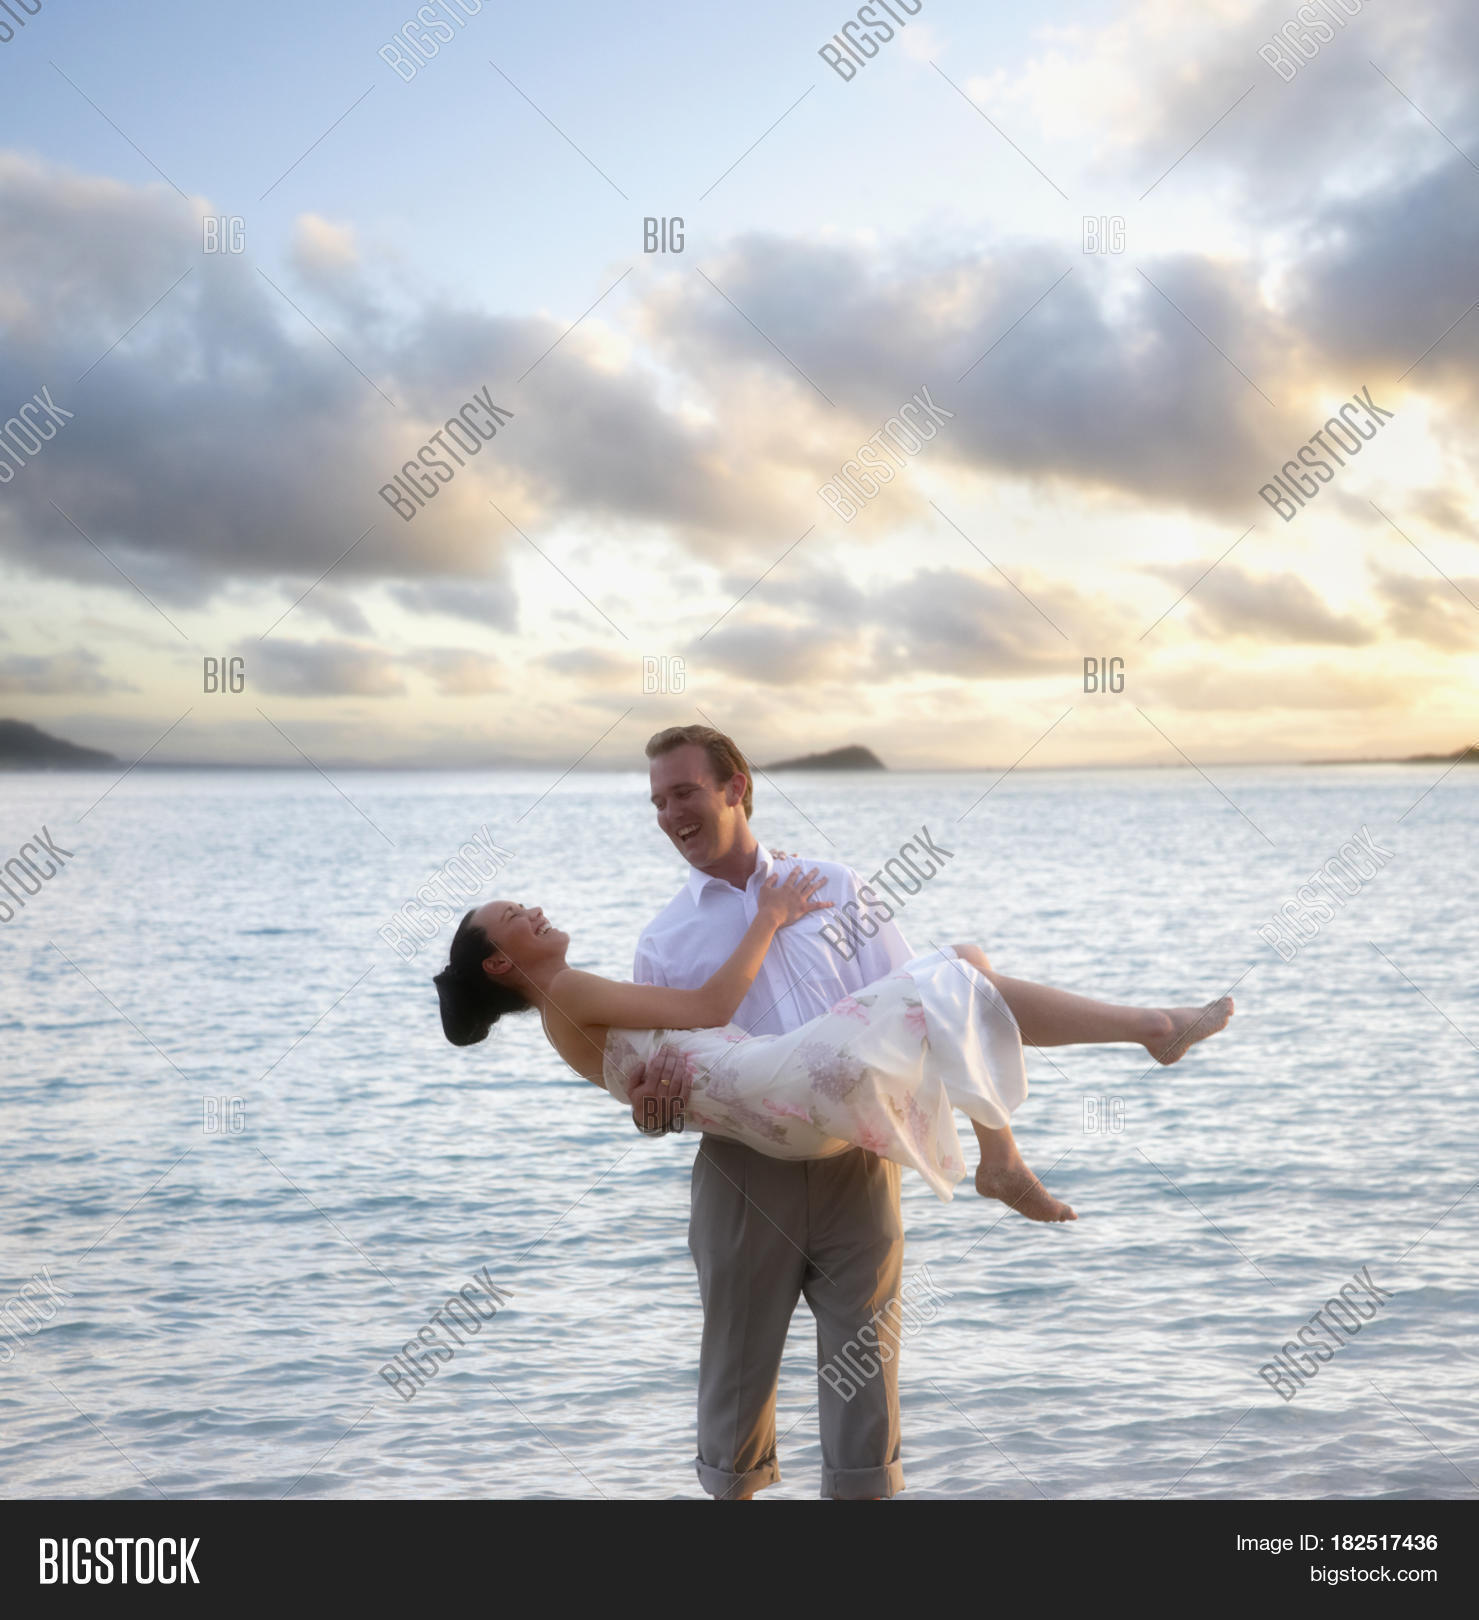 Man Carrying Woman Beach Image & Photo | Bigstock